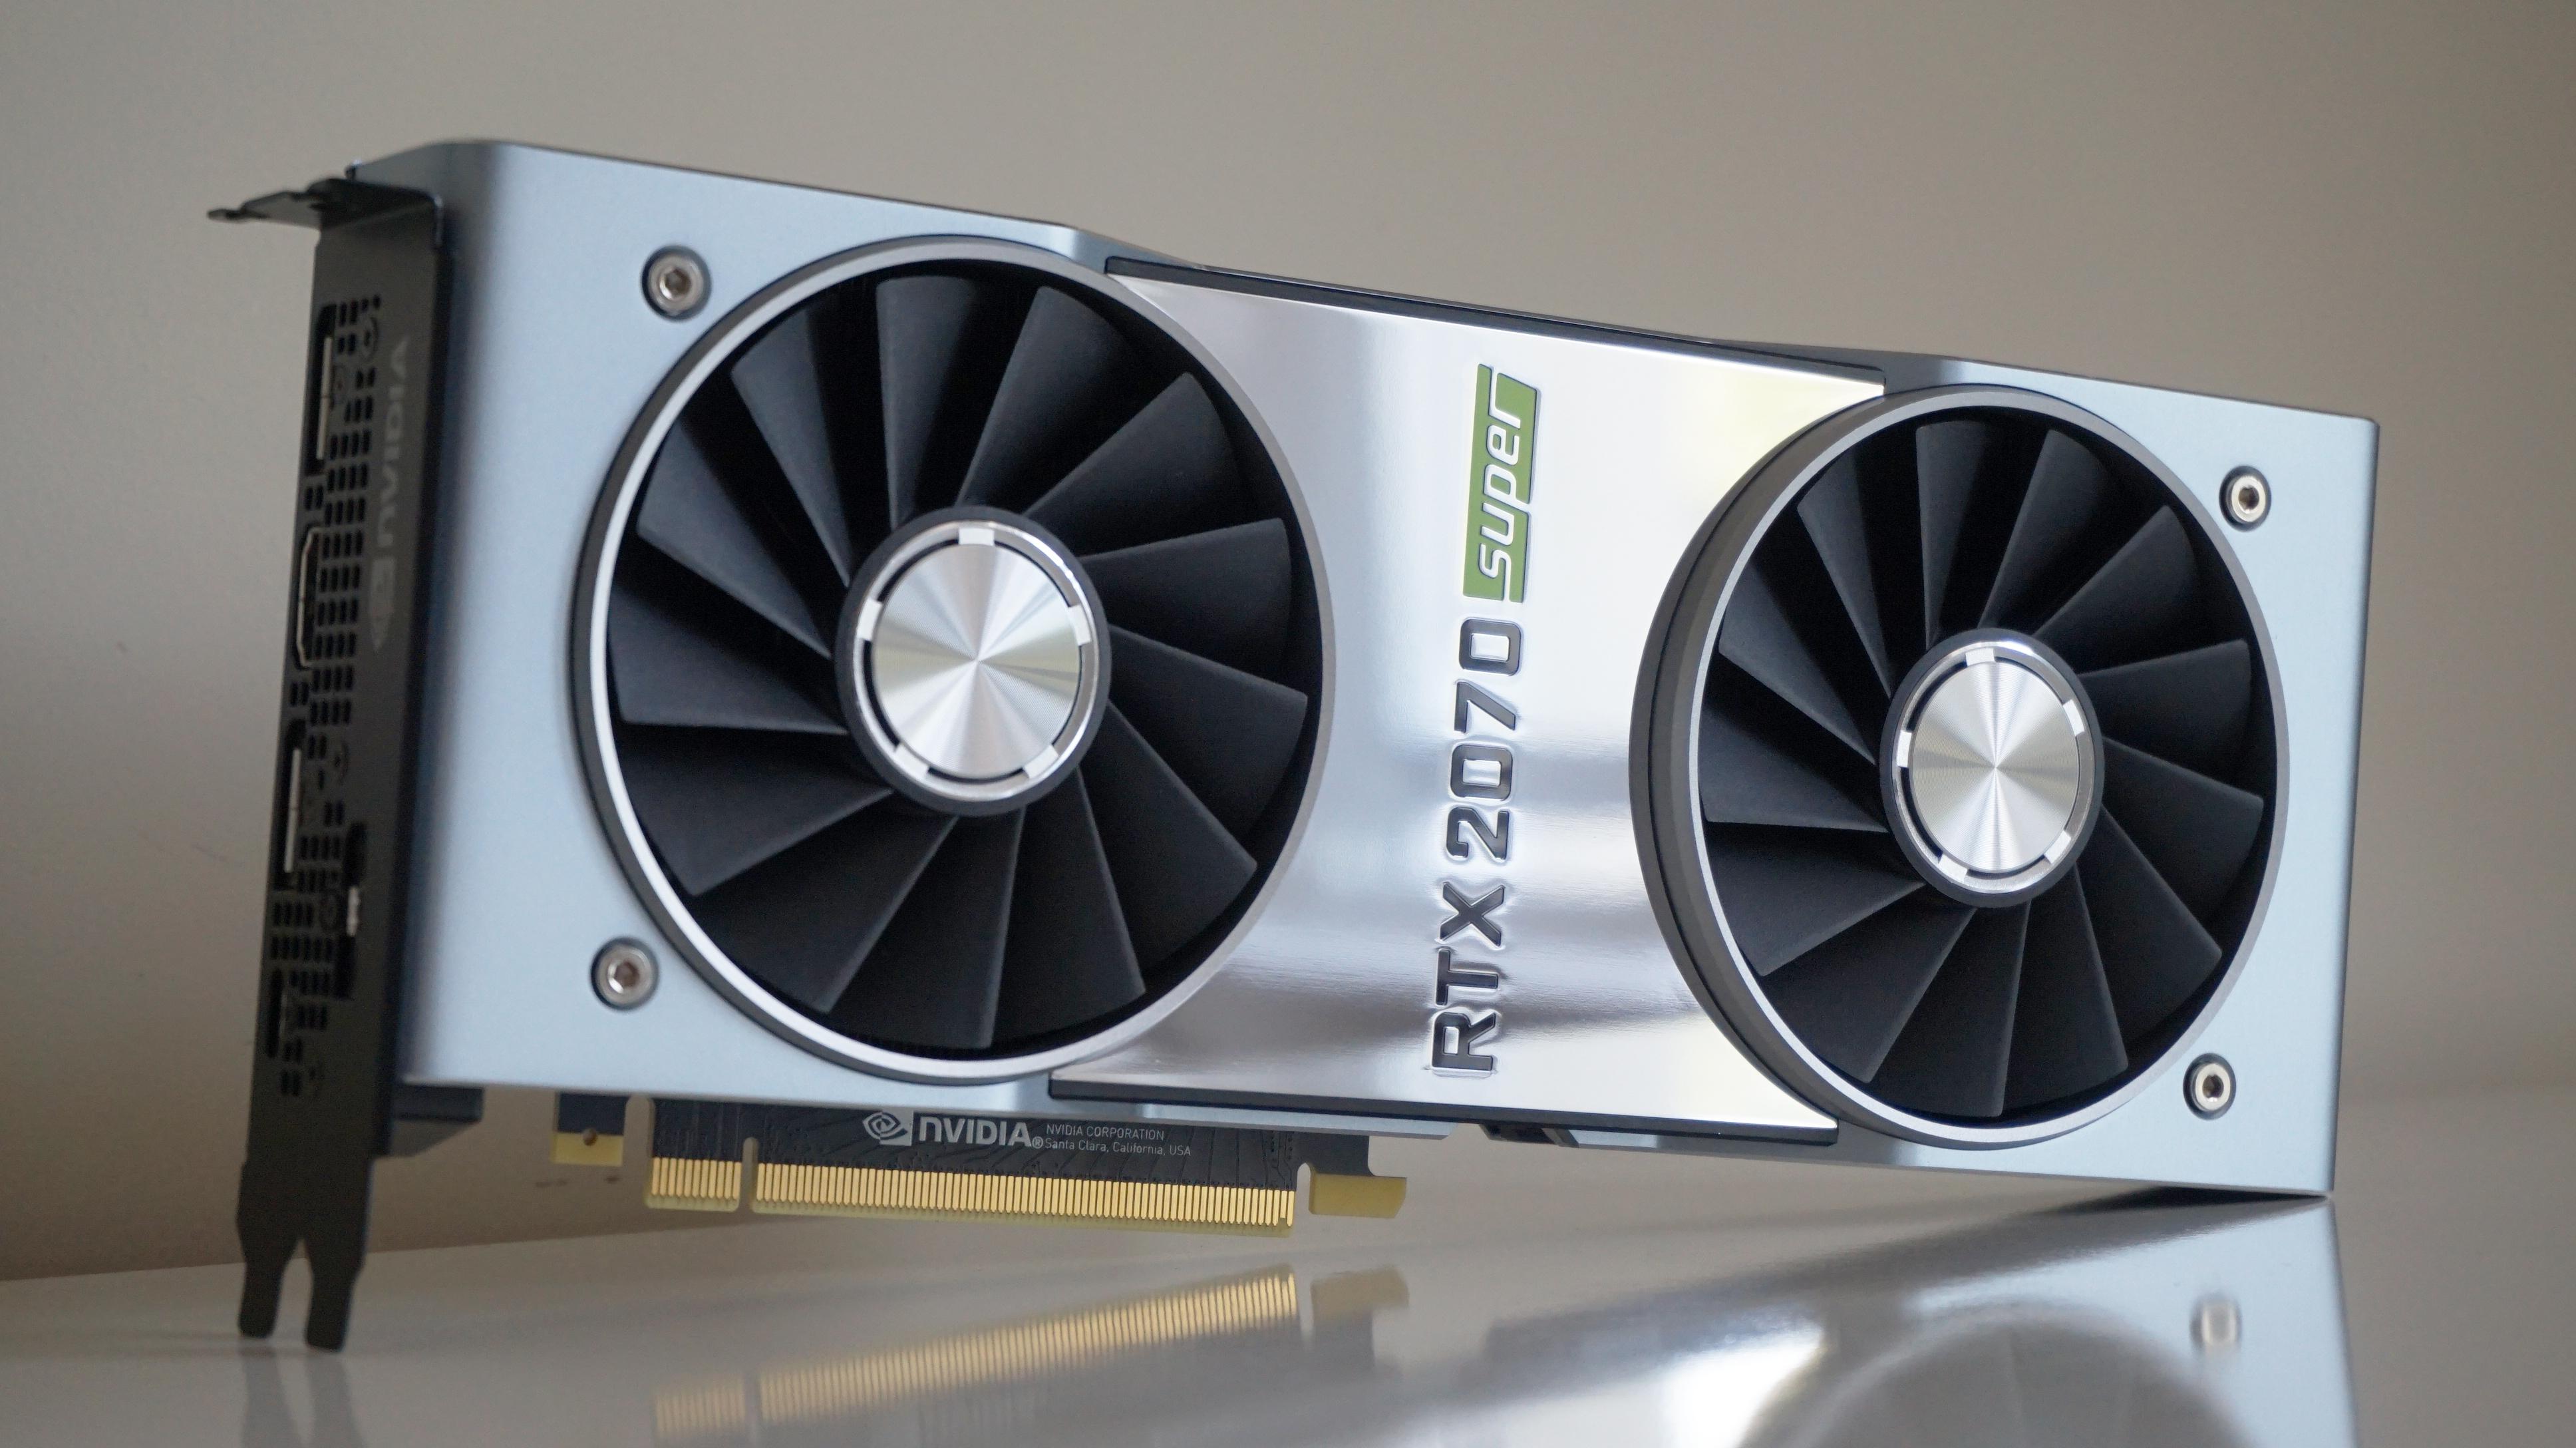 Nvidia GeForce RTX 2070 Super review | Rock Paper Shotgun